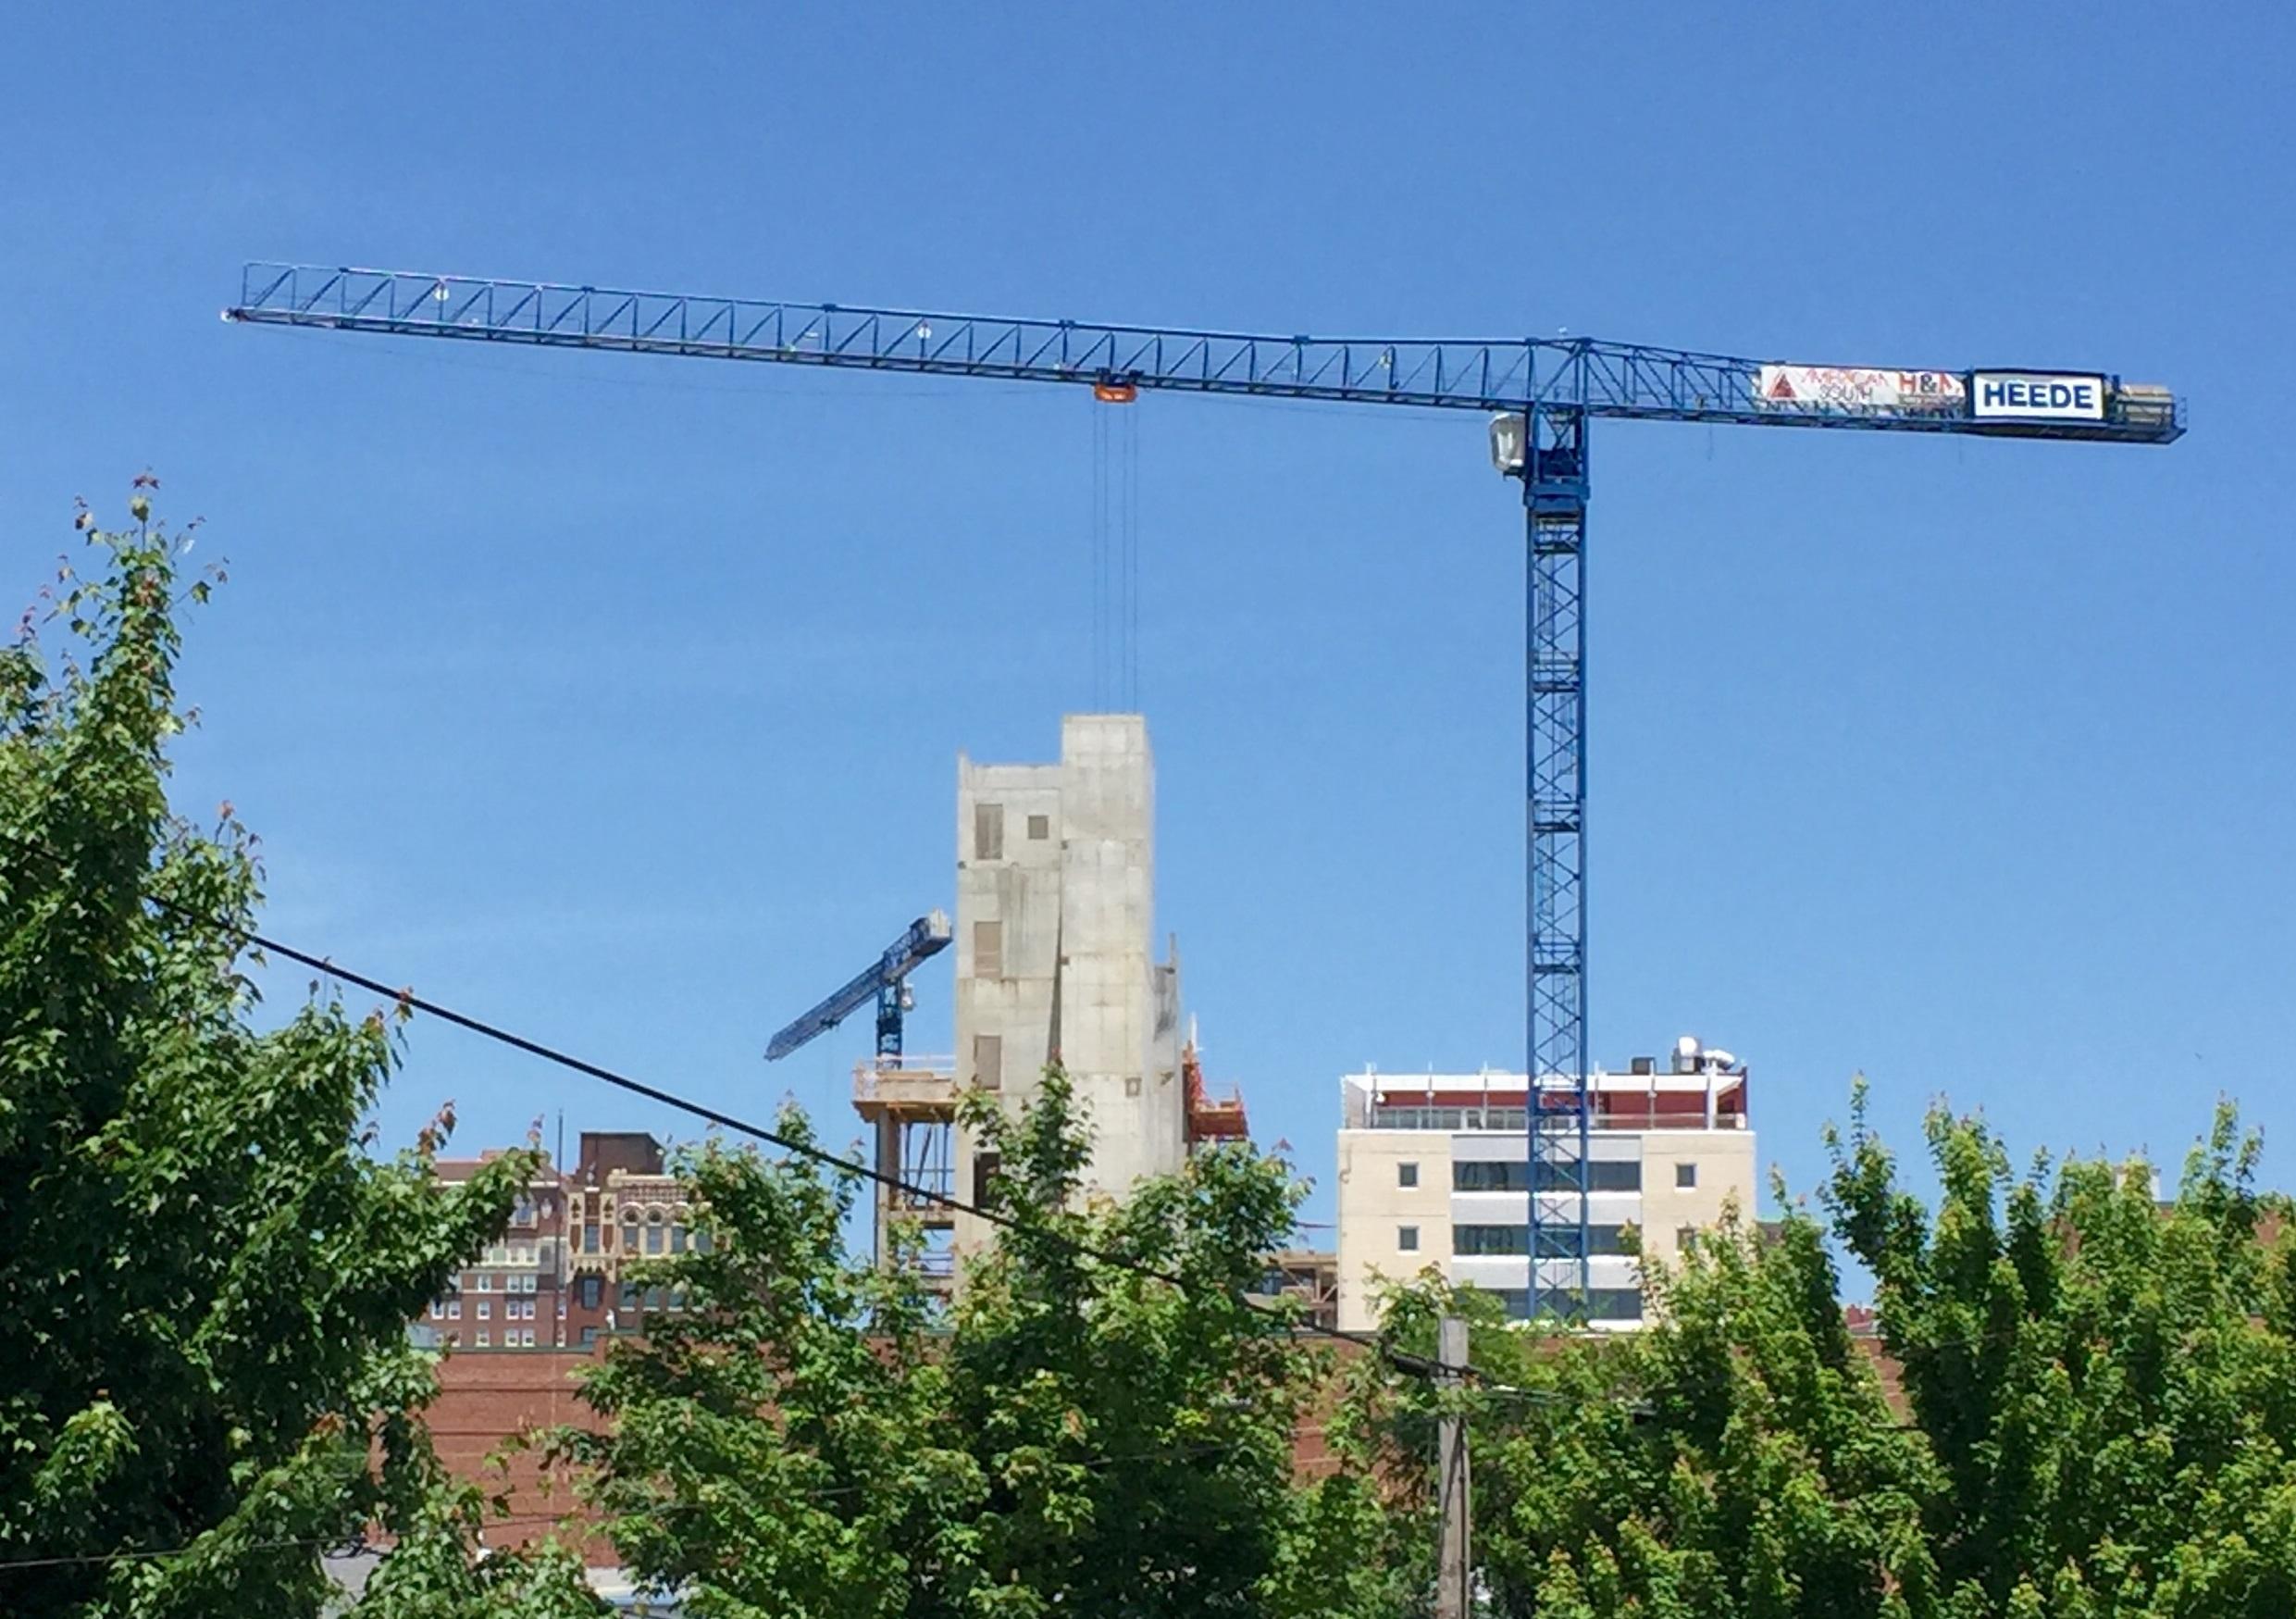 Photo of construction cranes